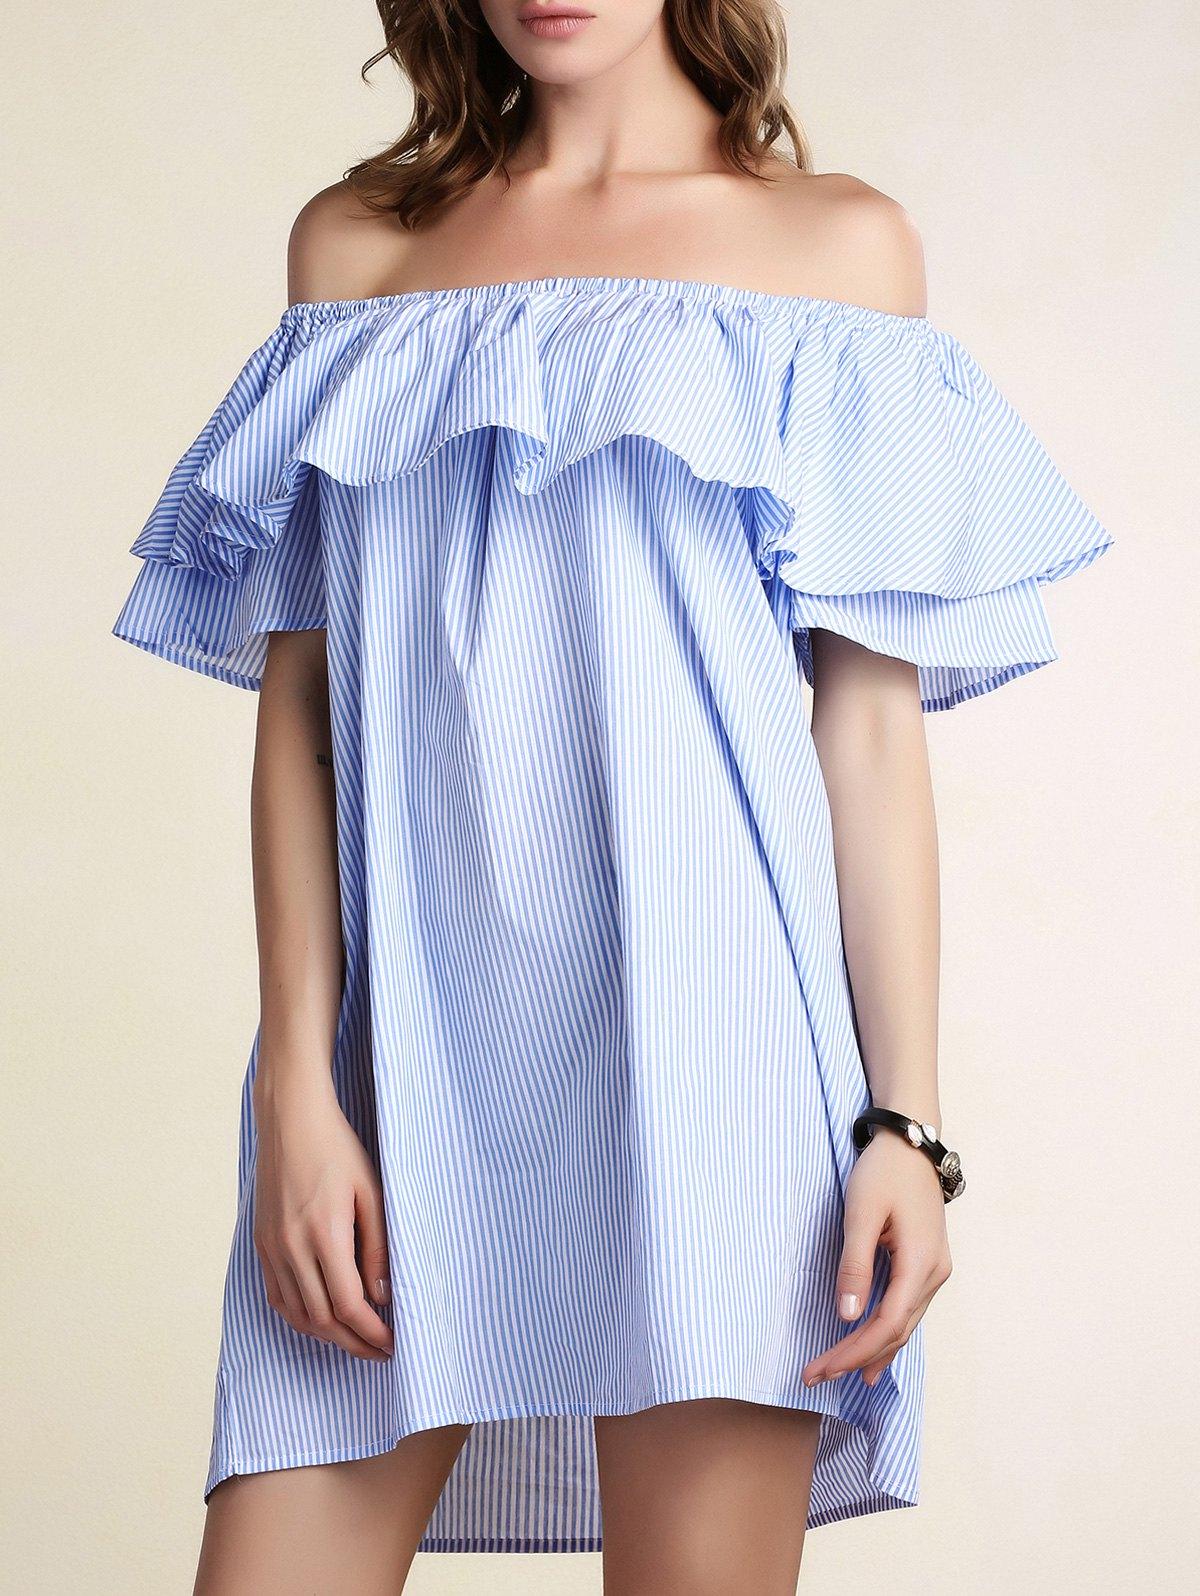 Scoop Neck Flouncing Loose Striped Dress